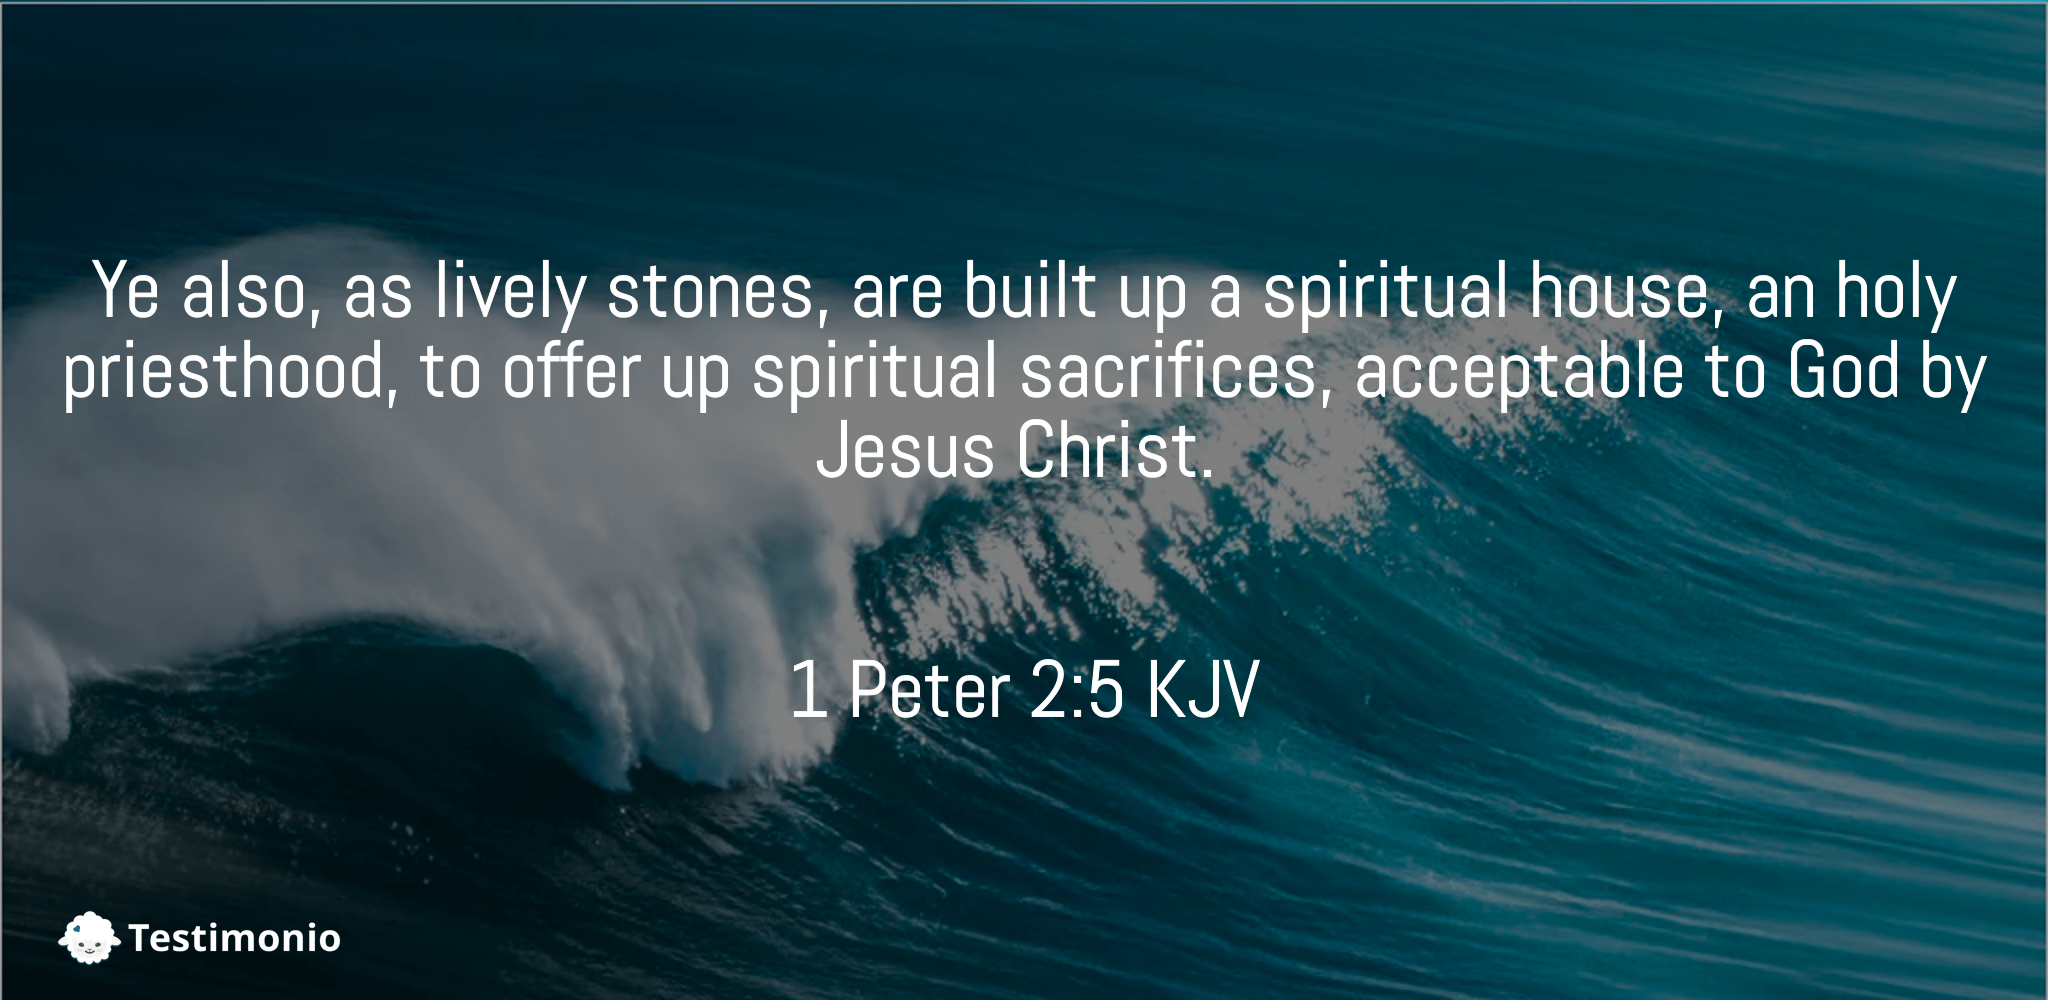 1 Peter 2:5